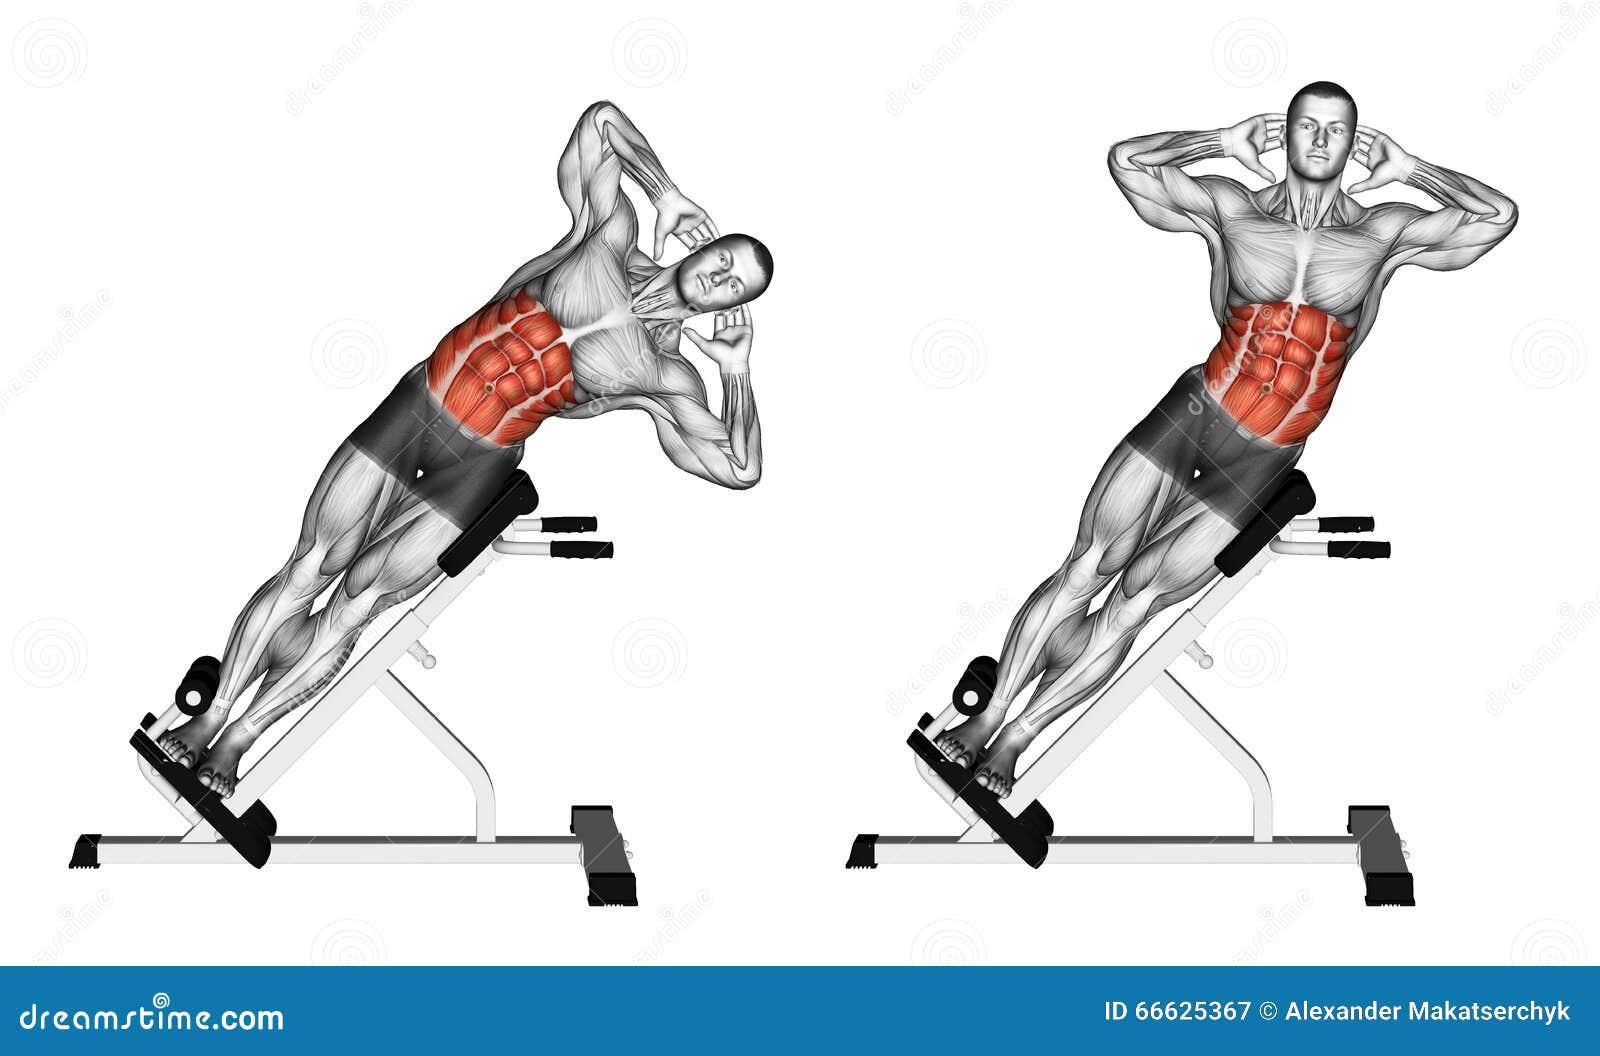 Exercising Curva lateral en banco